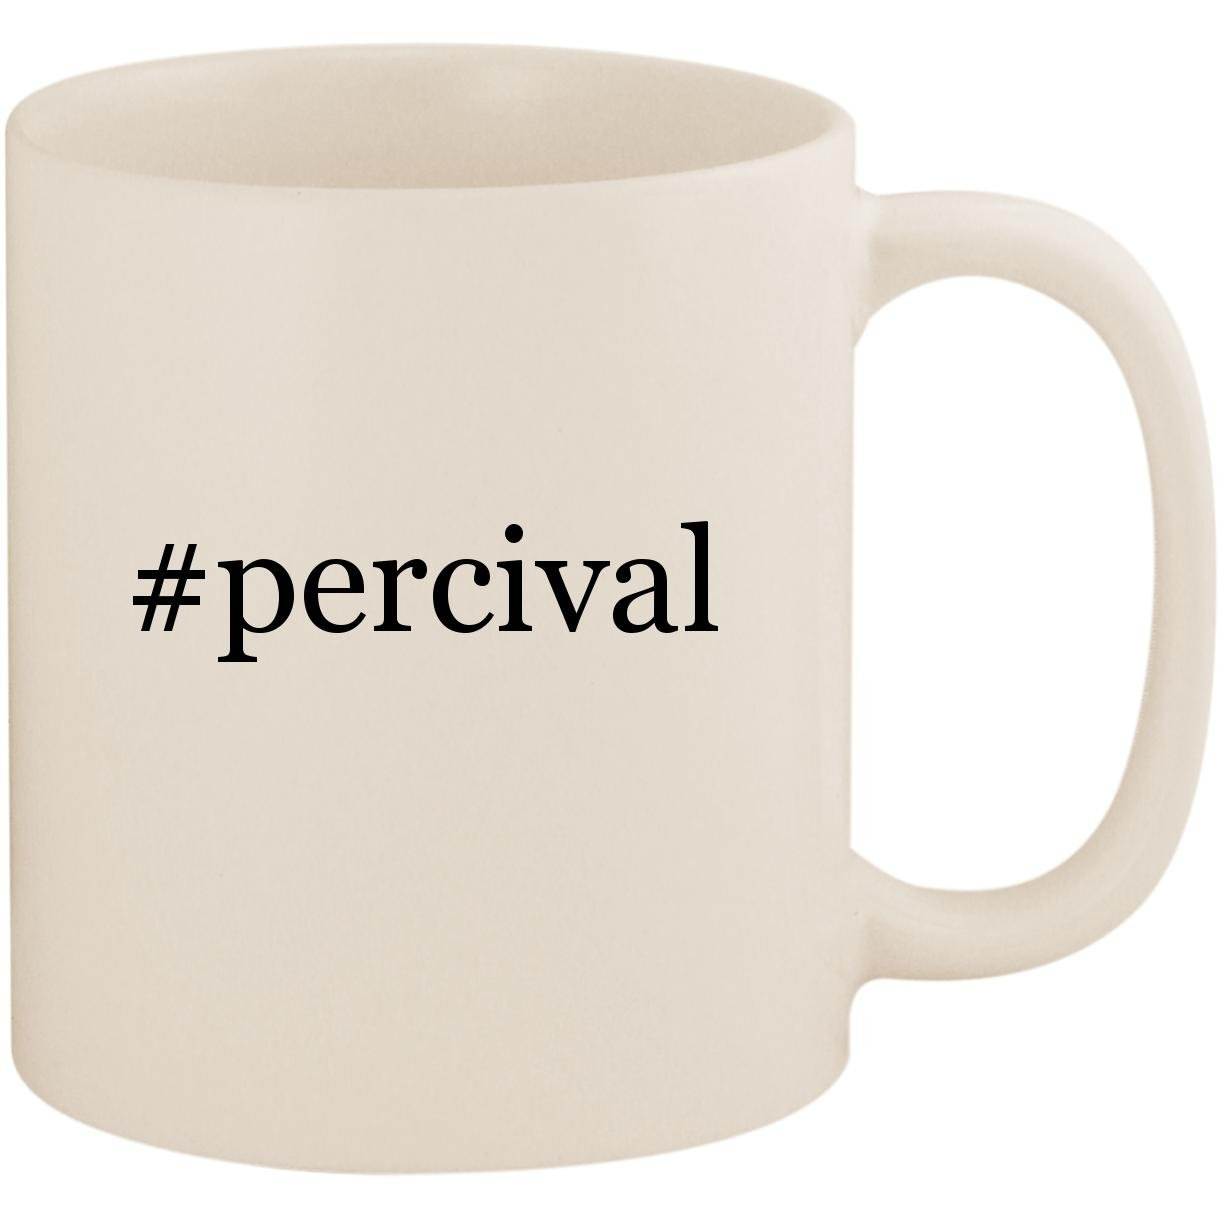 # percival – 11オンスセラミックコーヒーマグカップ ホワイト  ホワイト B07FM83F8Y